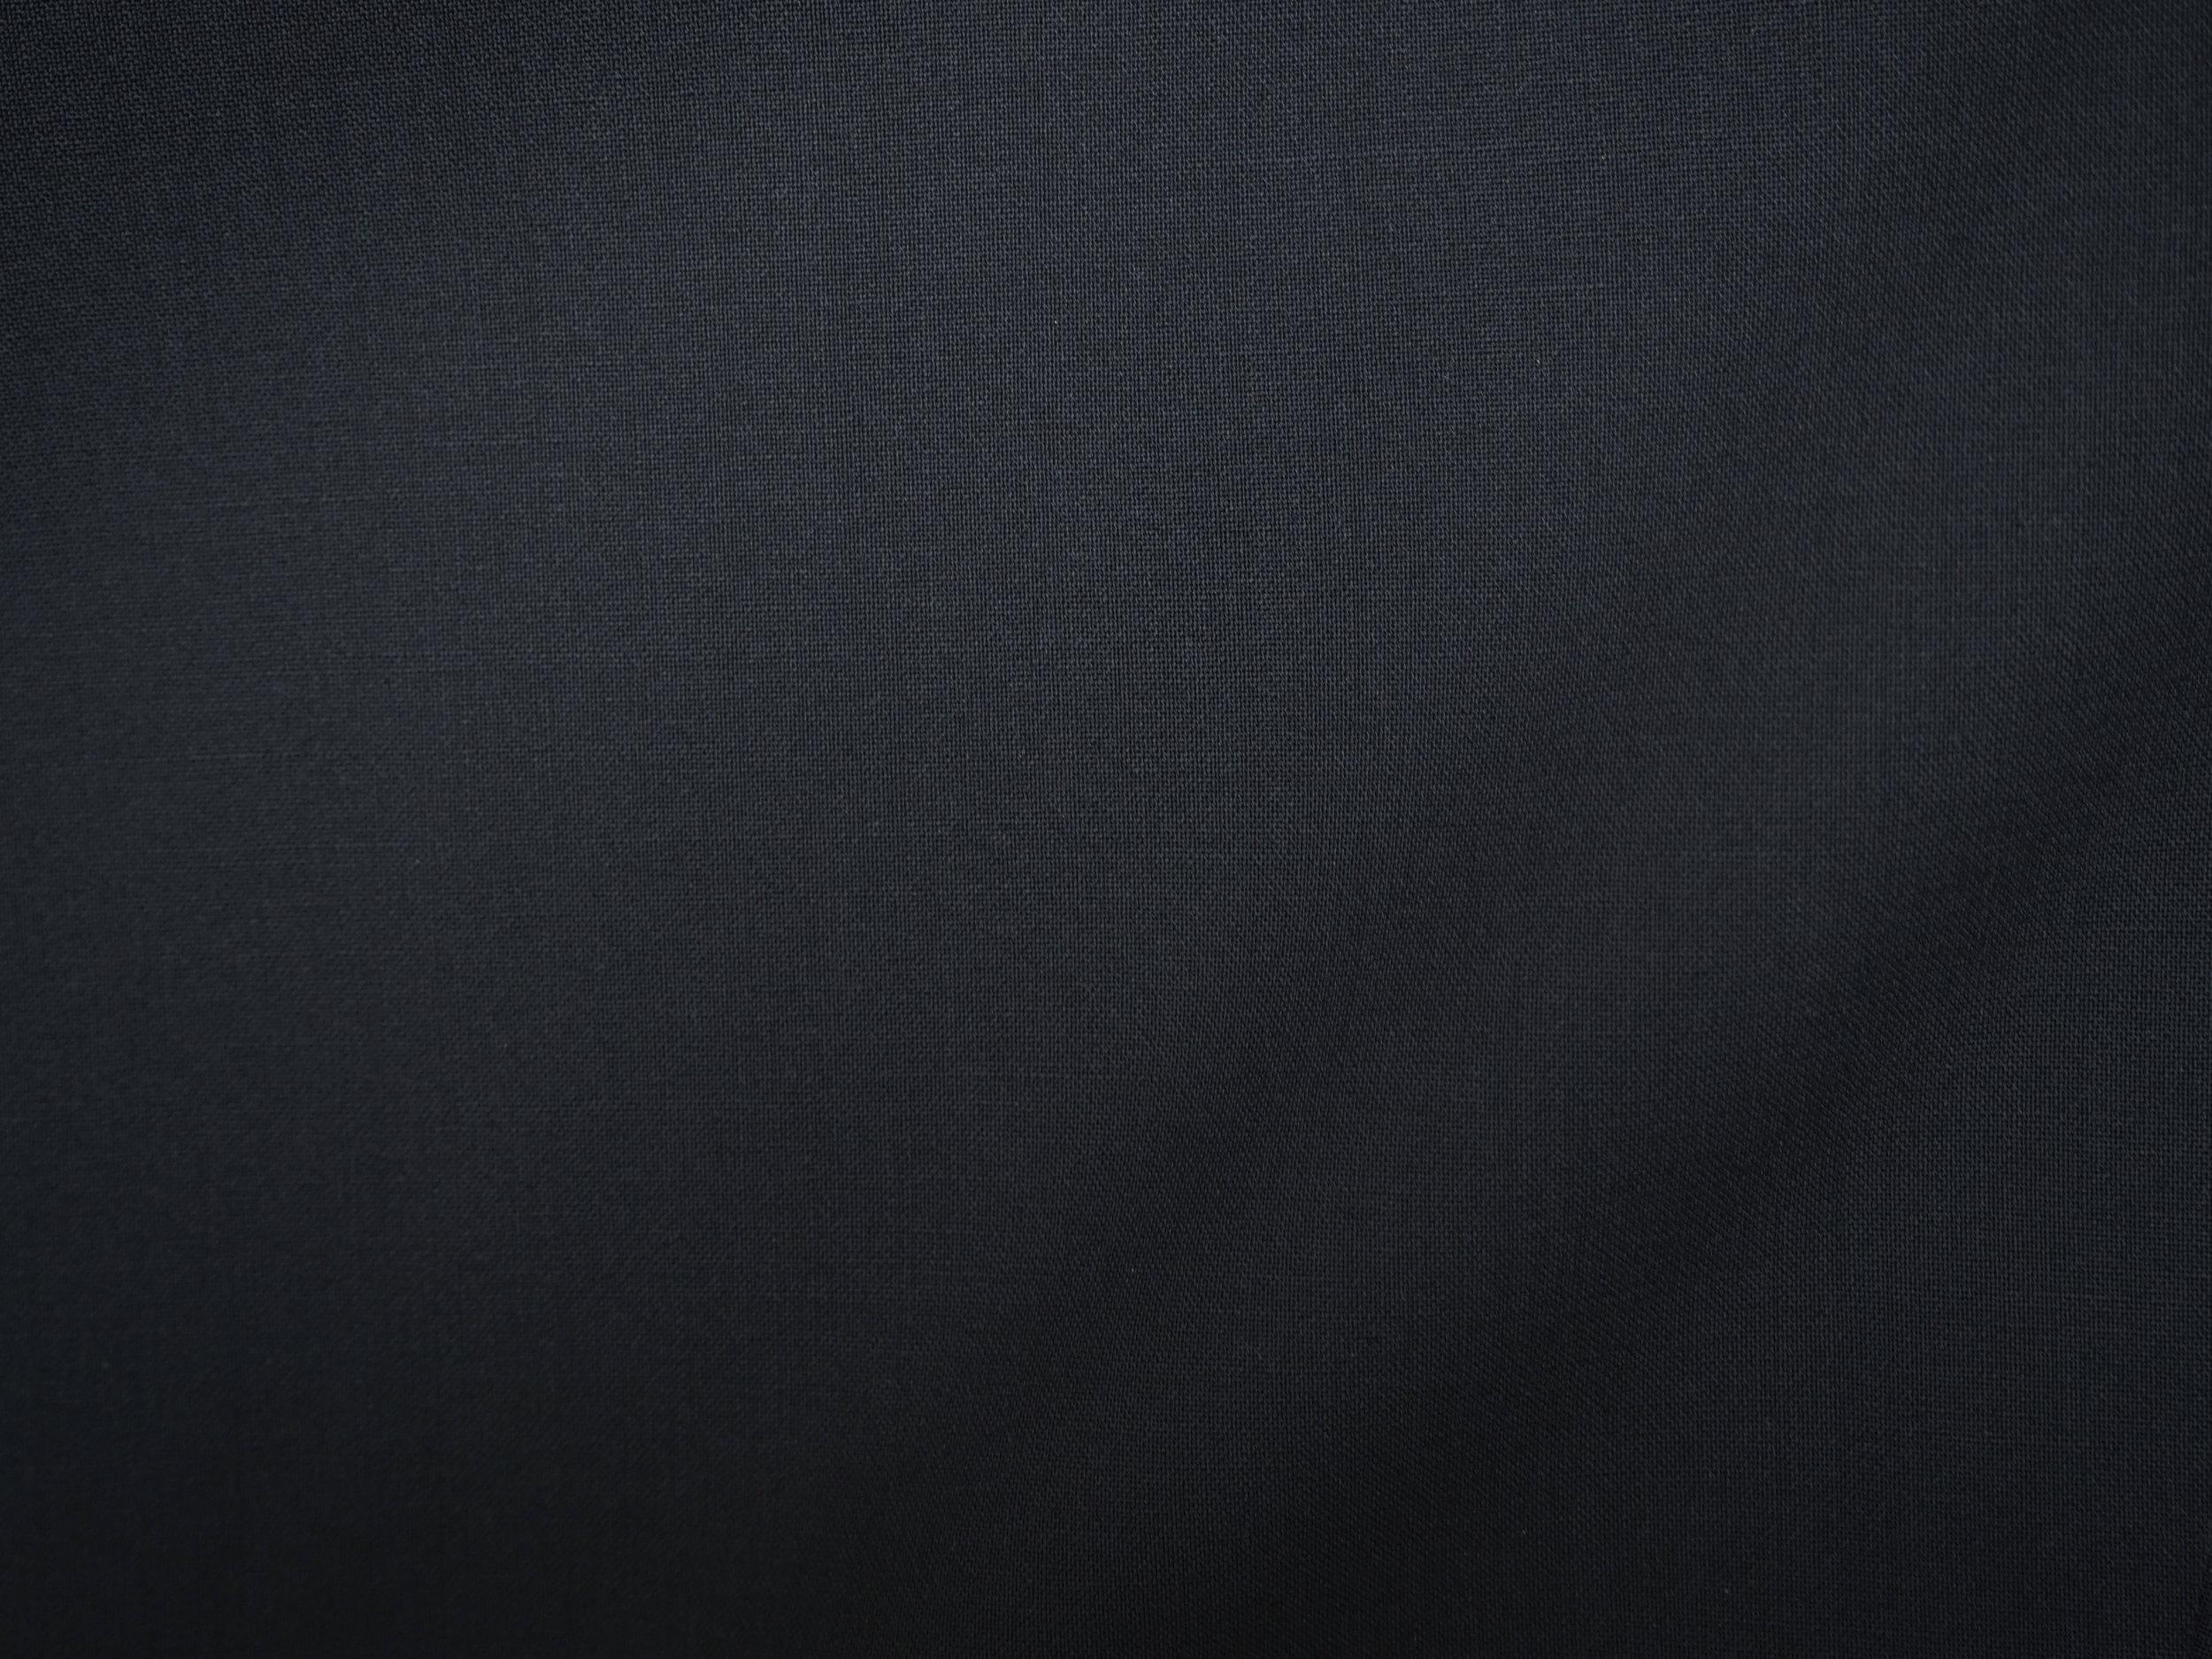 Stof---blåsort-2.jpg